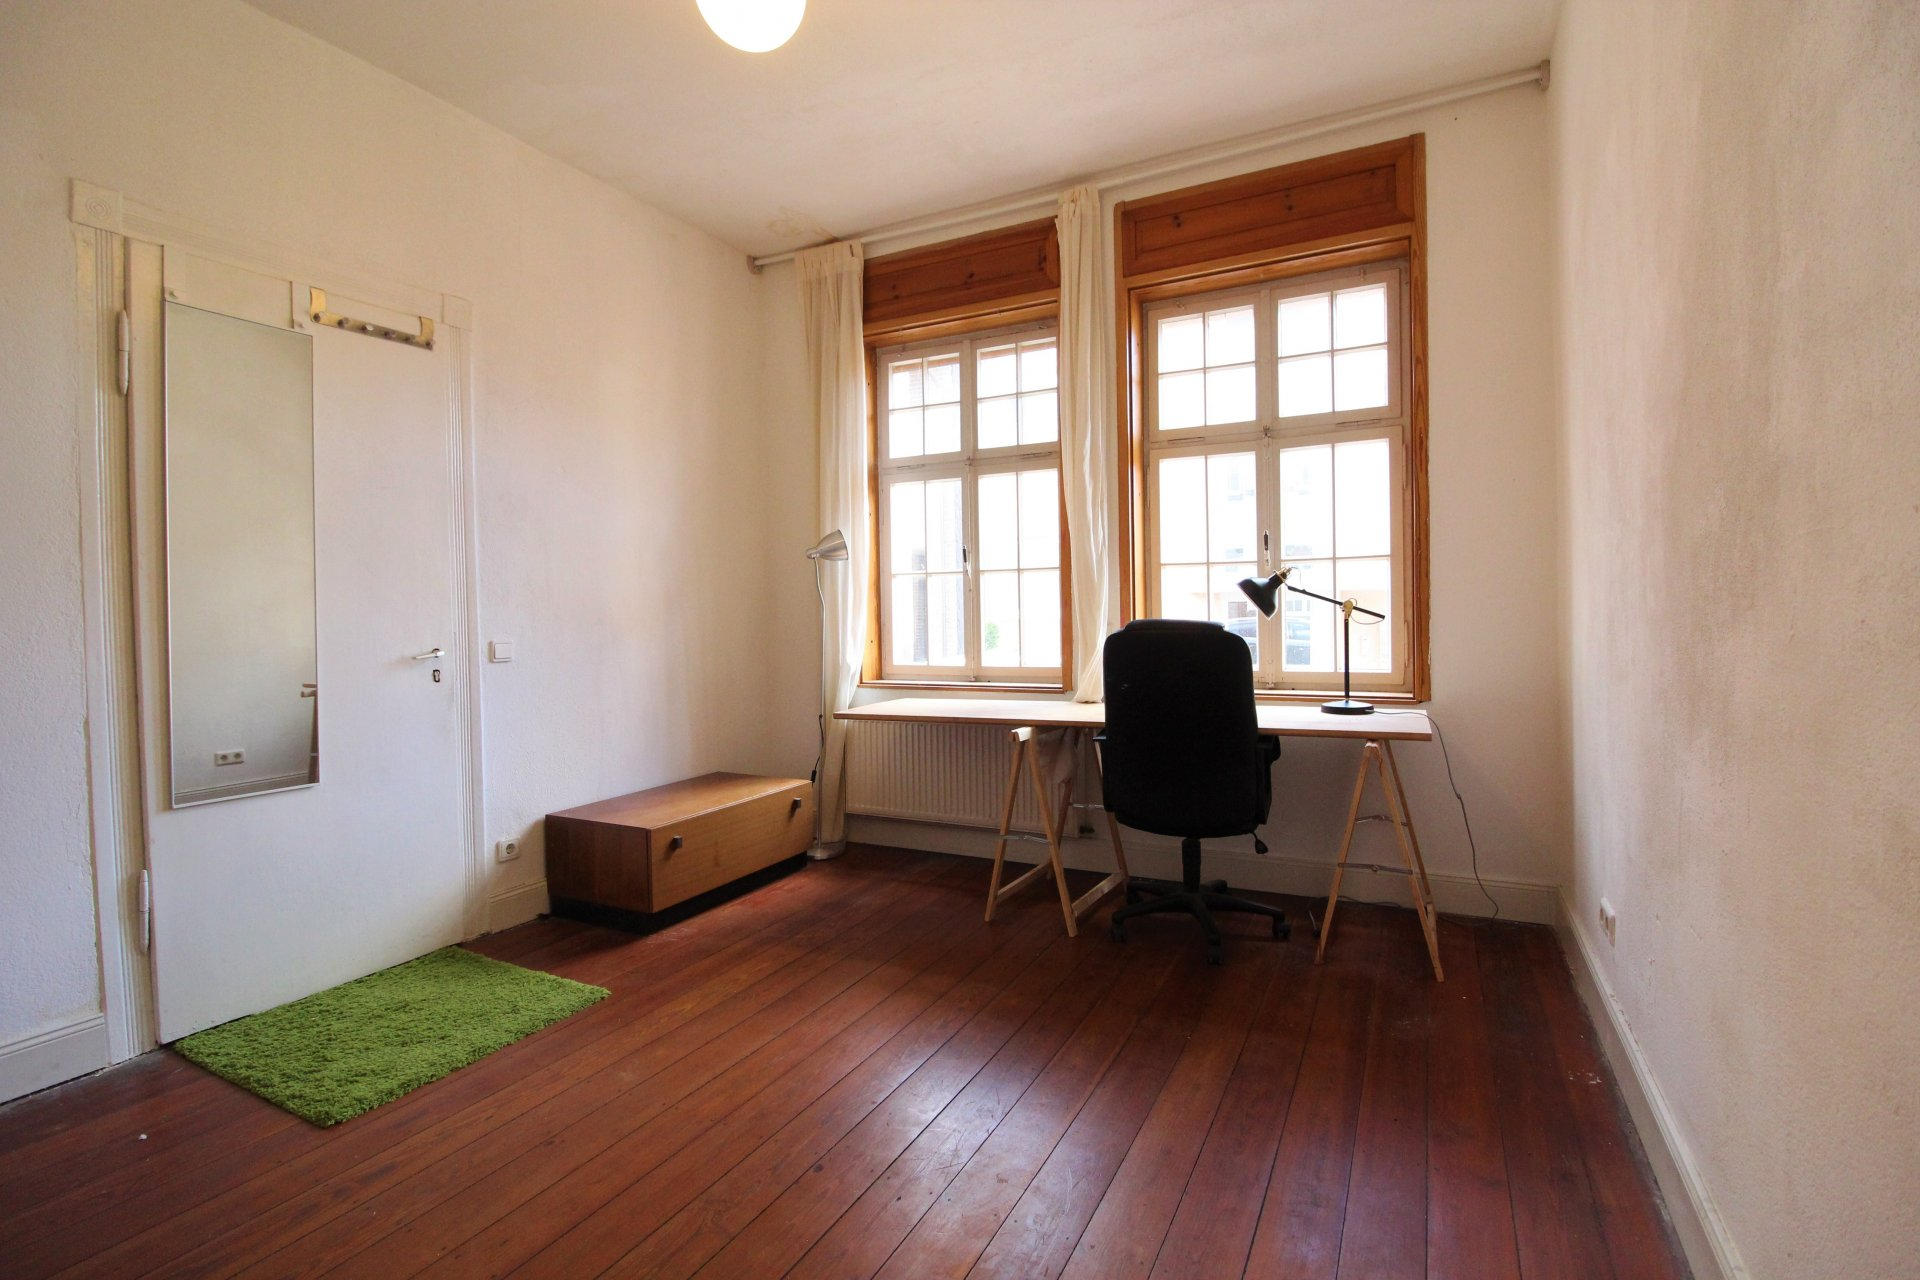 Zi.2 m. Fenstern u Tür.jpg